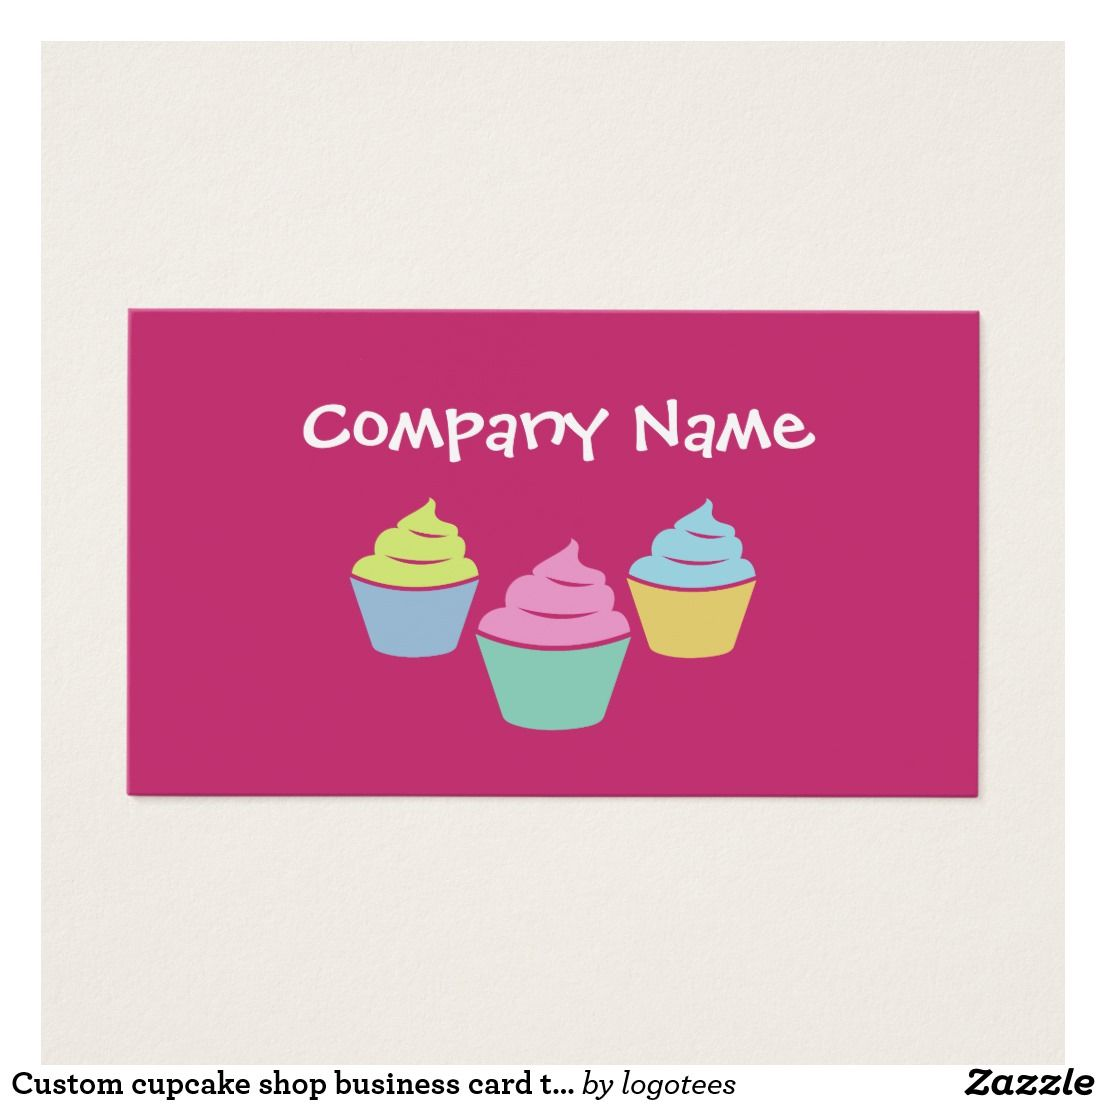 Custom cupcake shop business card template. Cute colorful cup cake ...